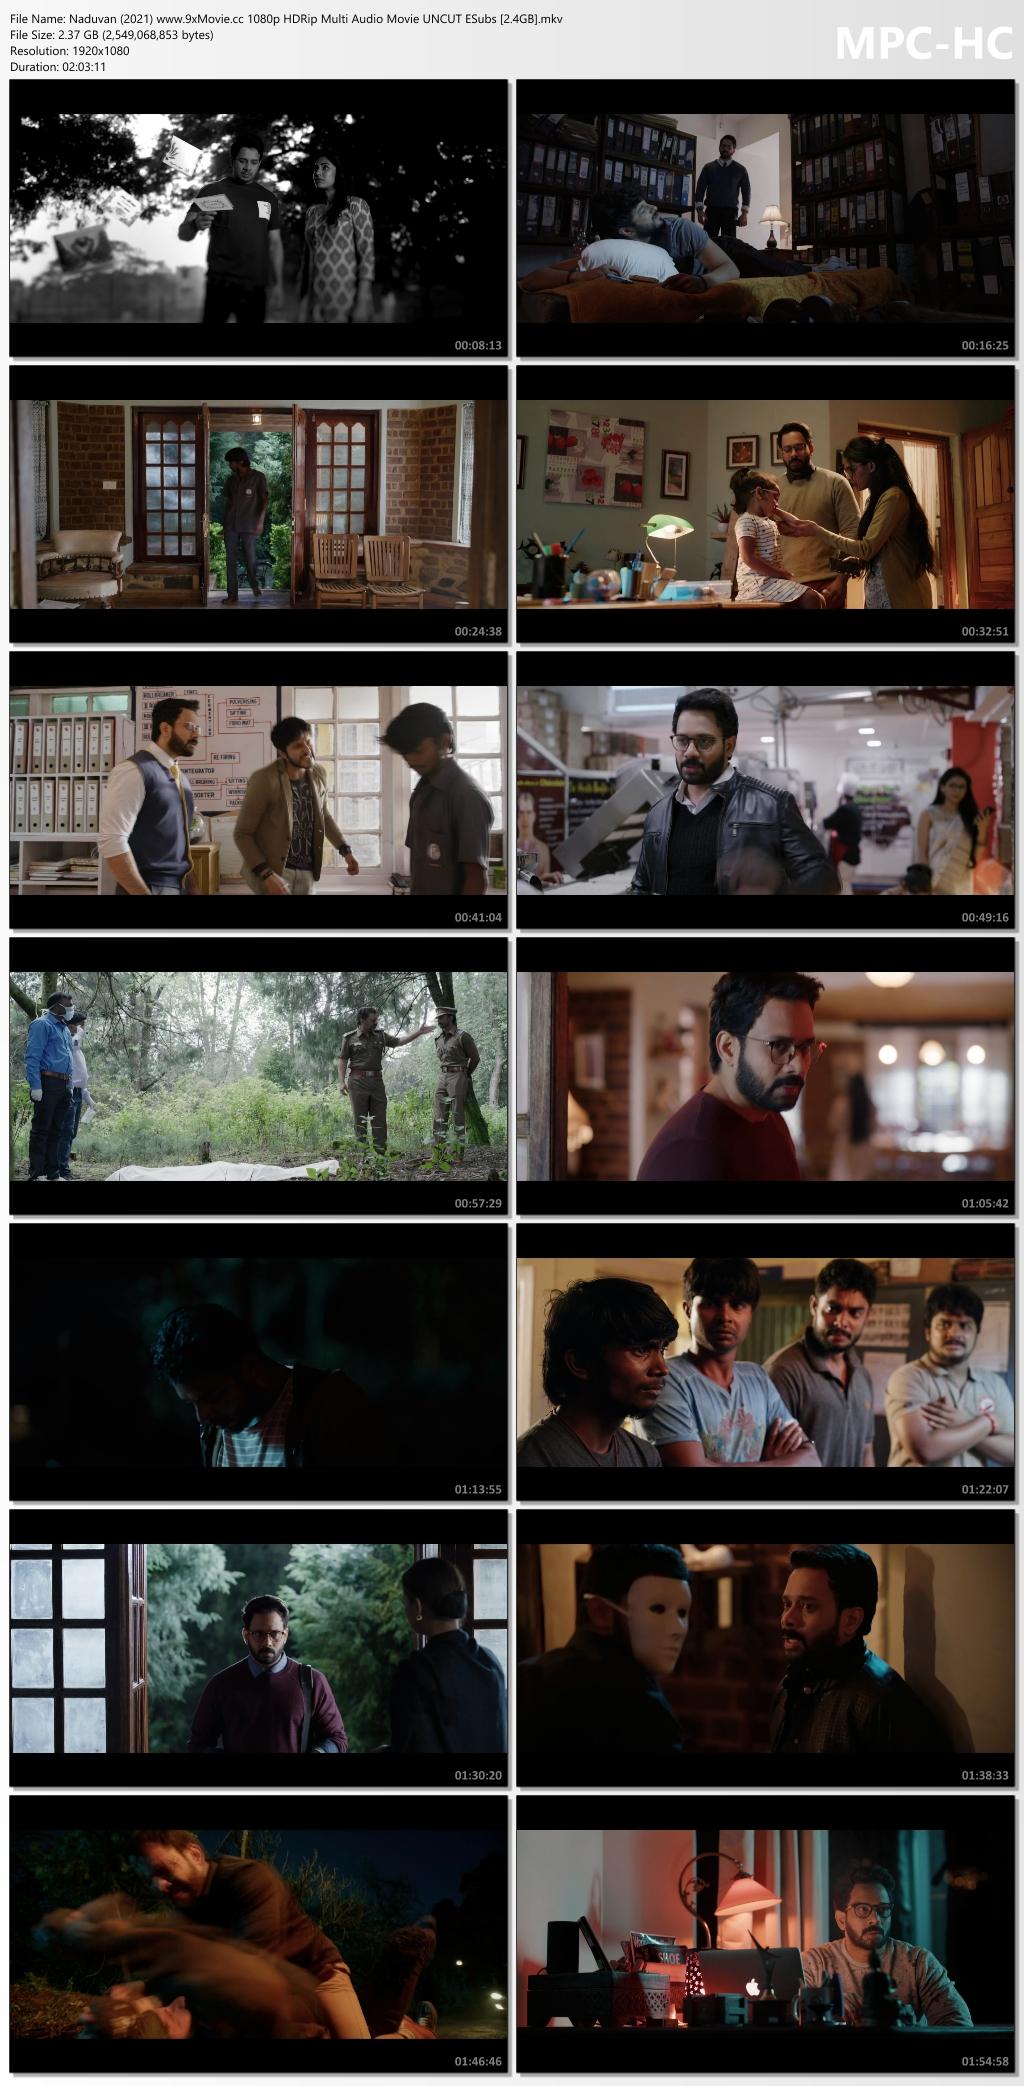 Naduvan-2021-www-9x-Movie-cc-1080p-HDRip-Multi-Audio-Movie-UNCUT-ESubs-2-4-GB-mkv